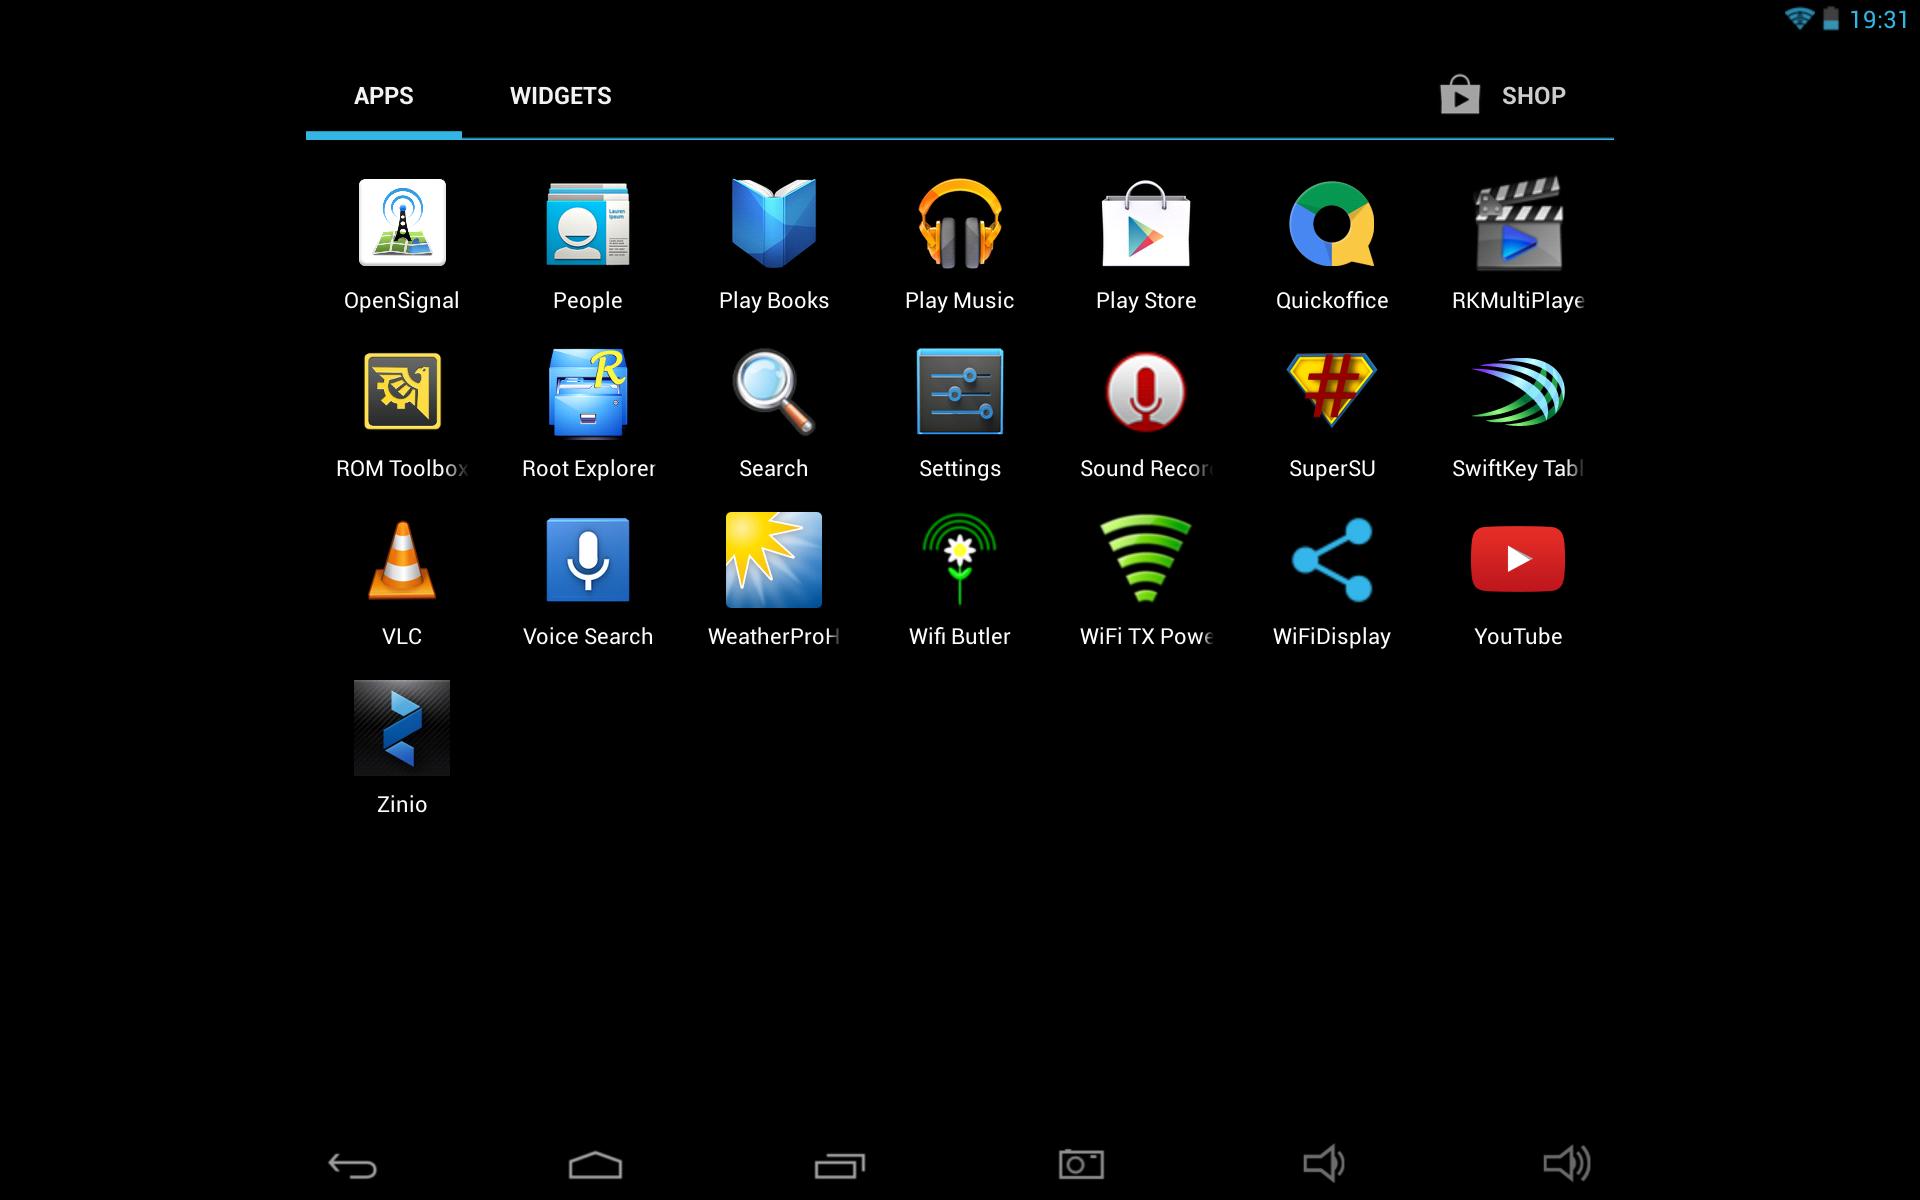 Screenshot_2013-10-20-19-31-55.png